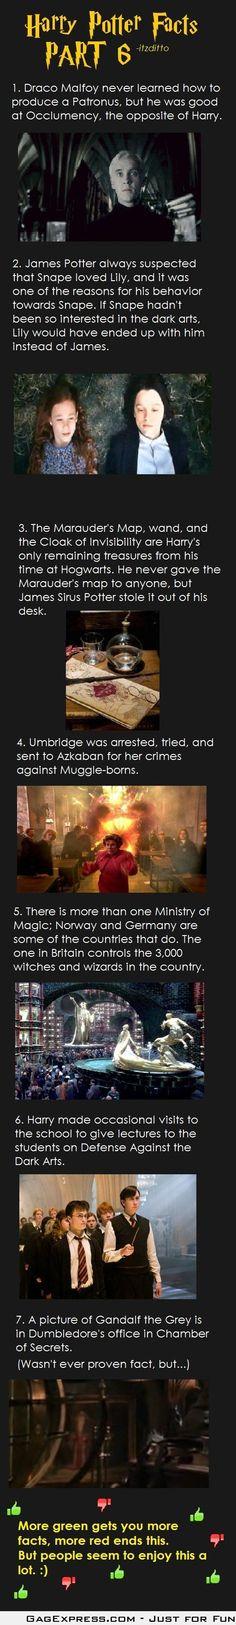 Harry Potter Facts Part 6